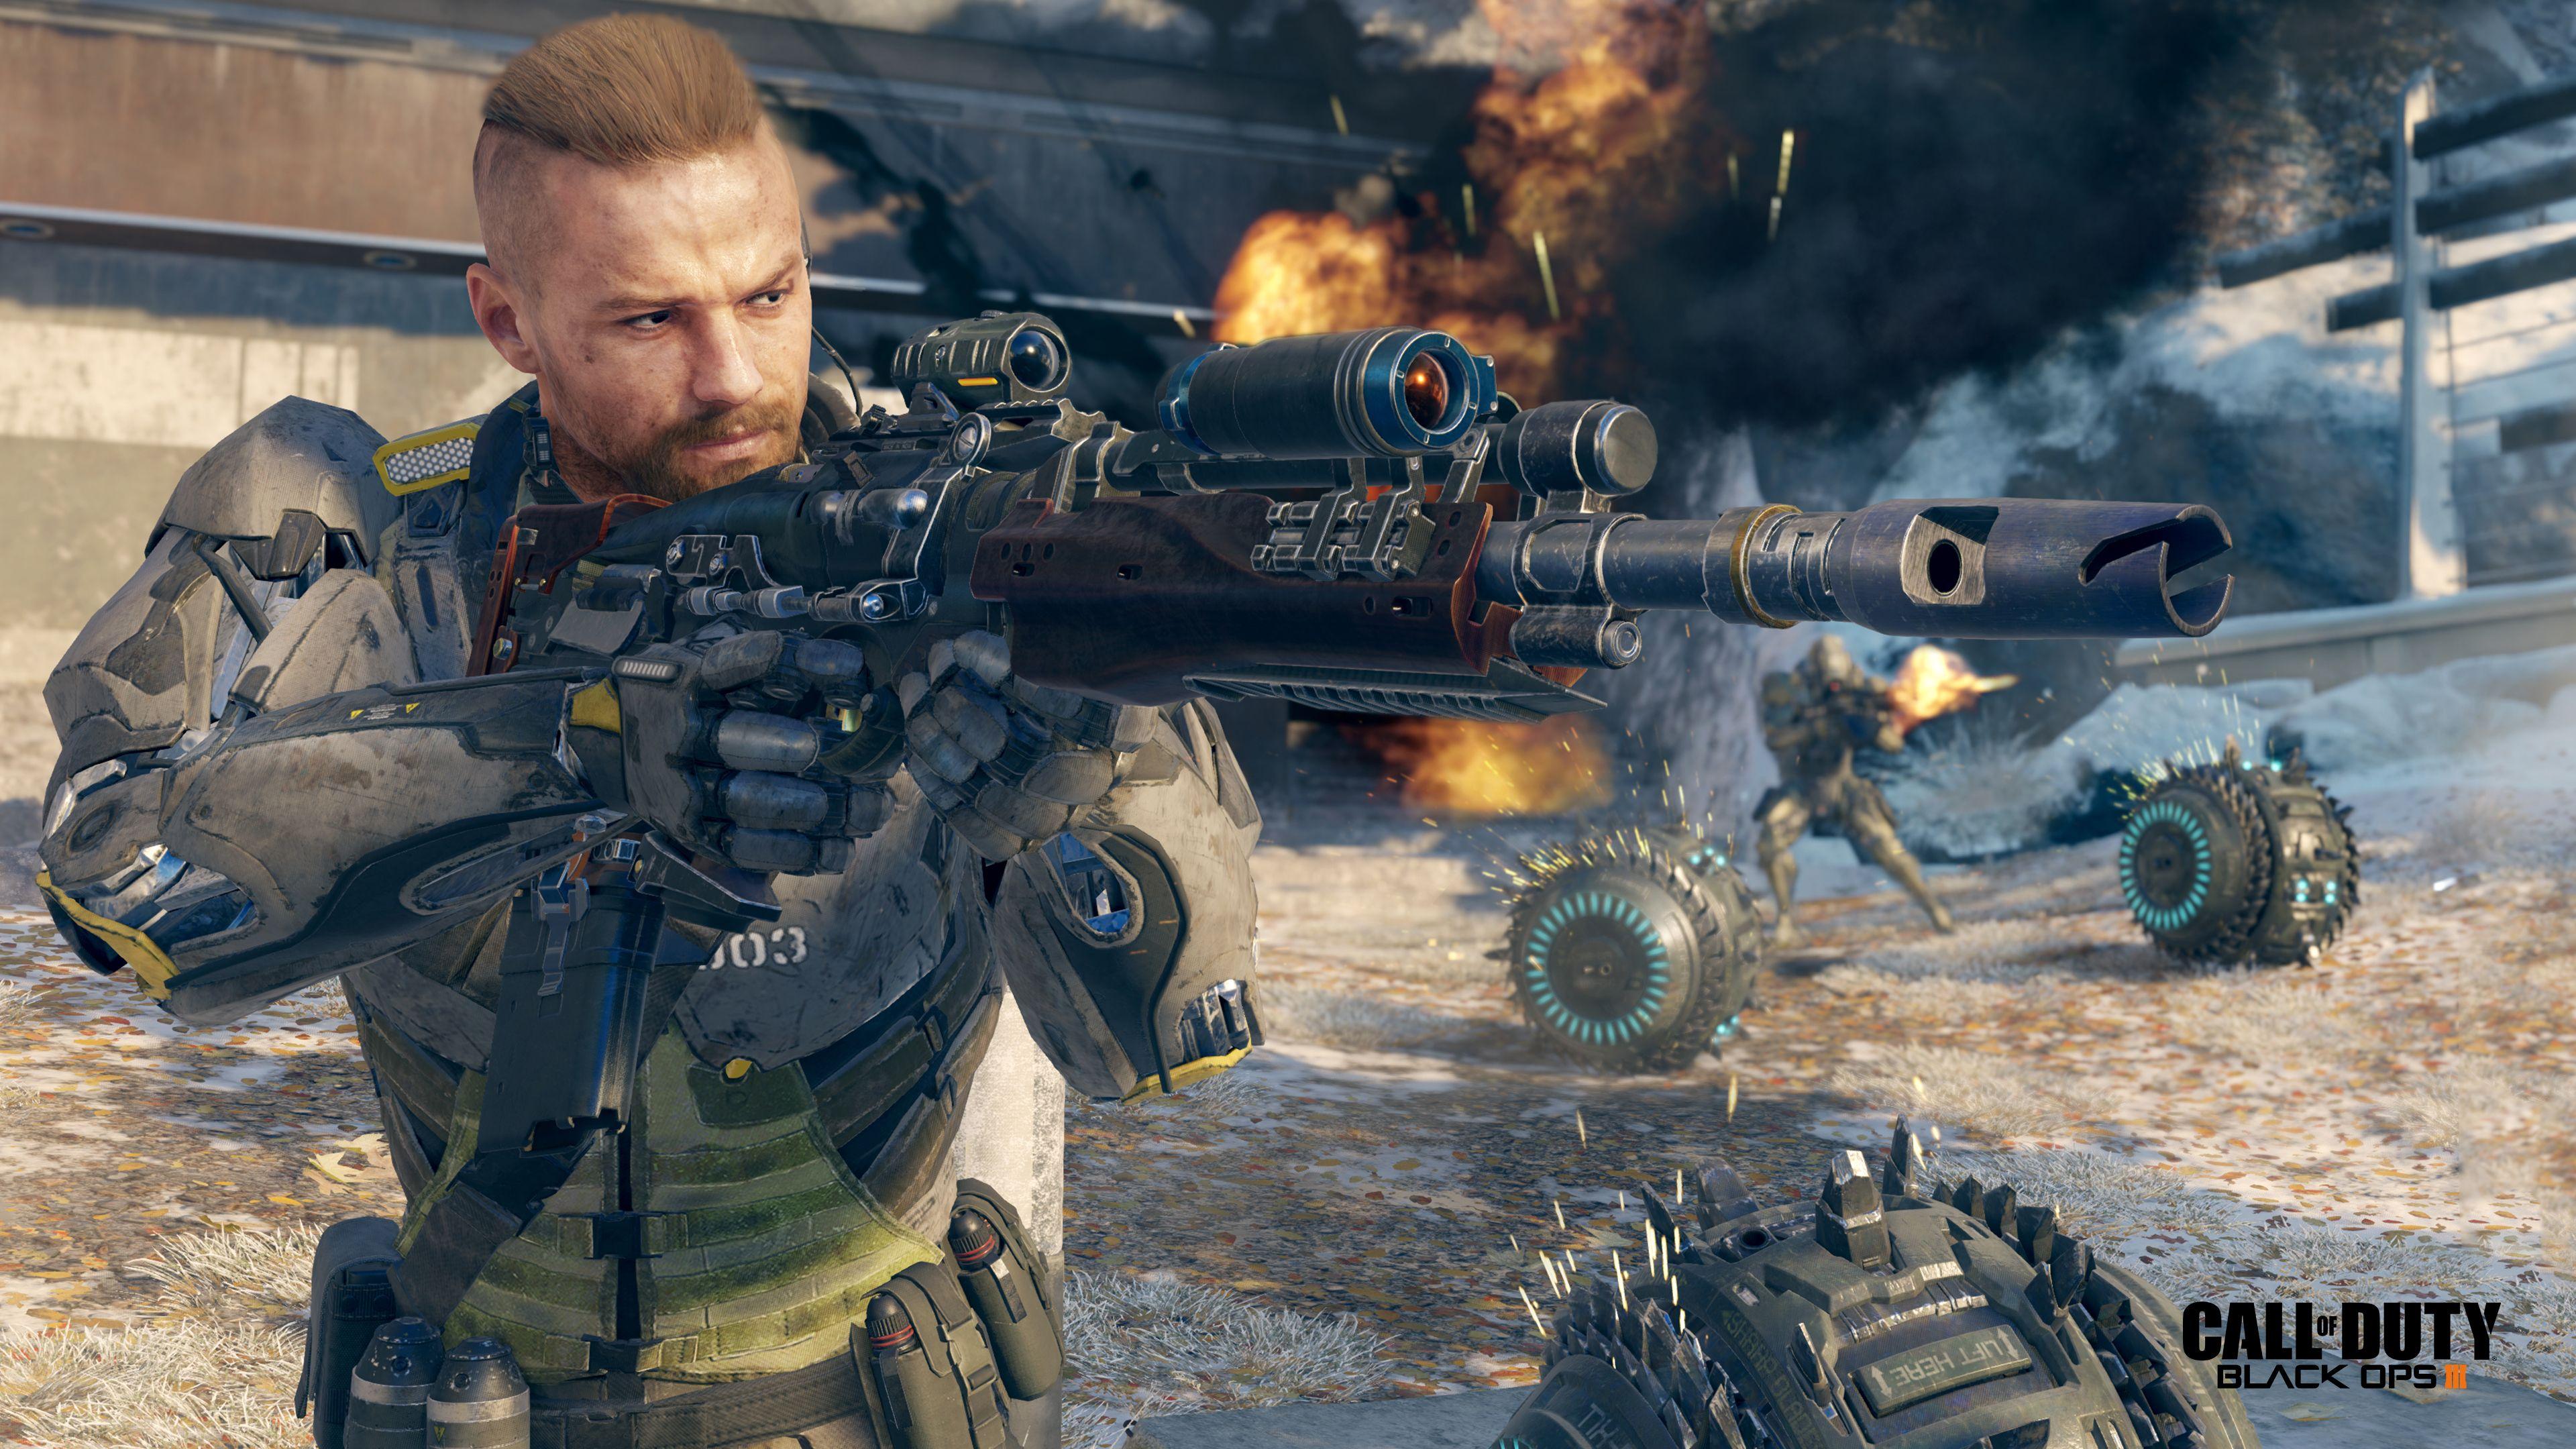 Call Of Duty: Black Ops III - very advanced warfare